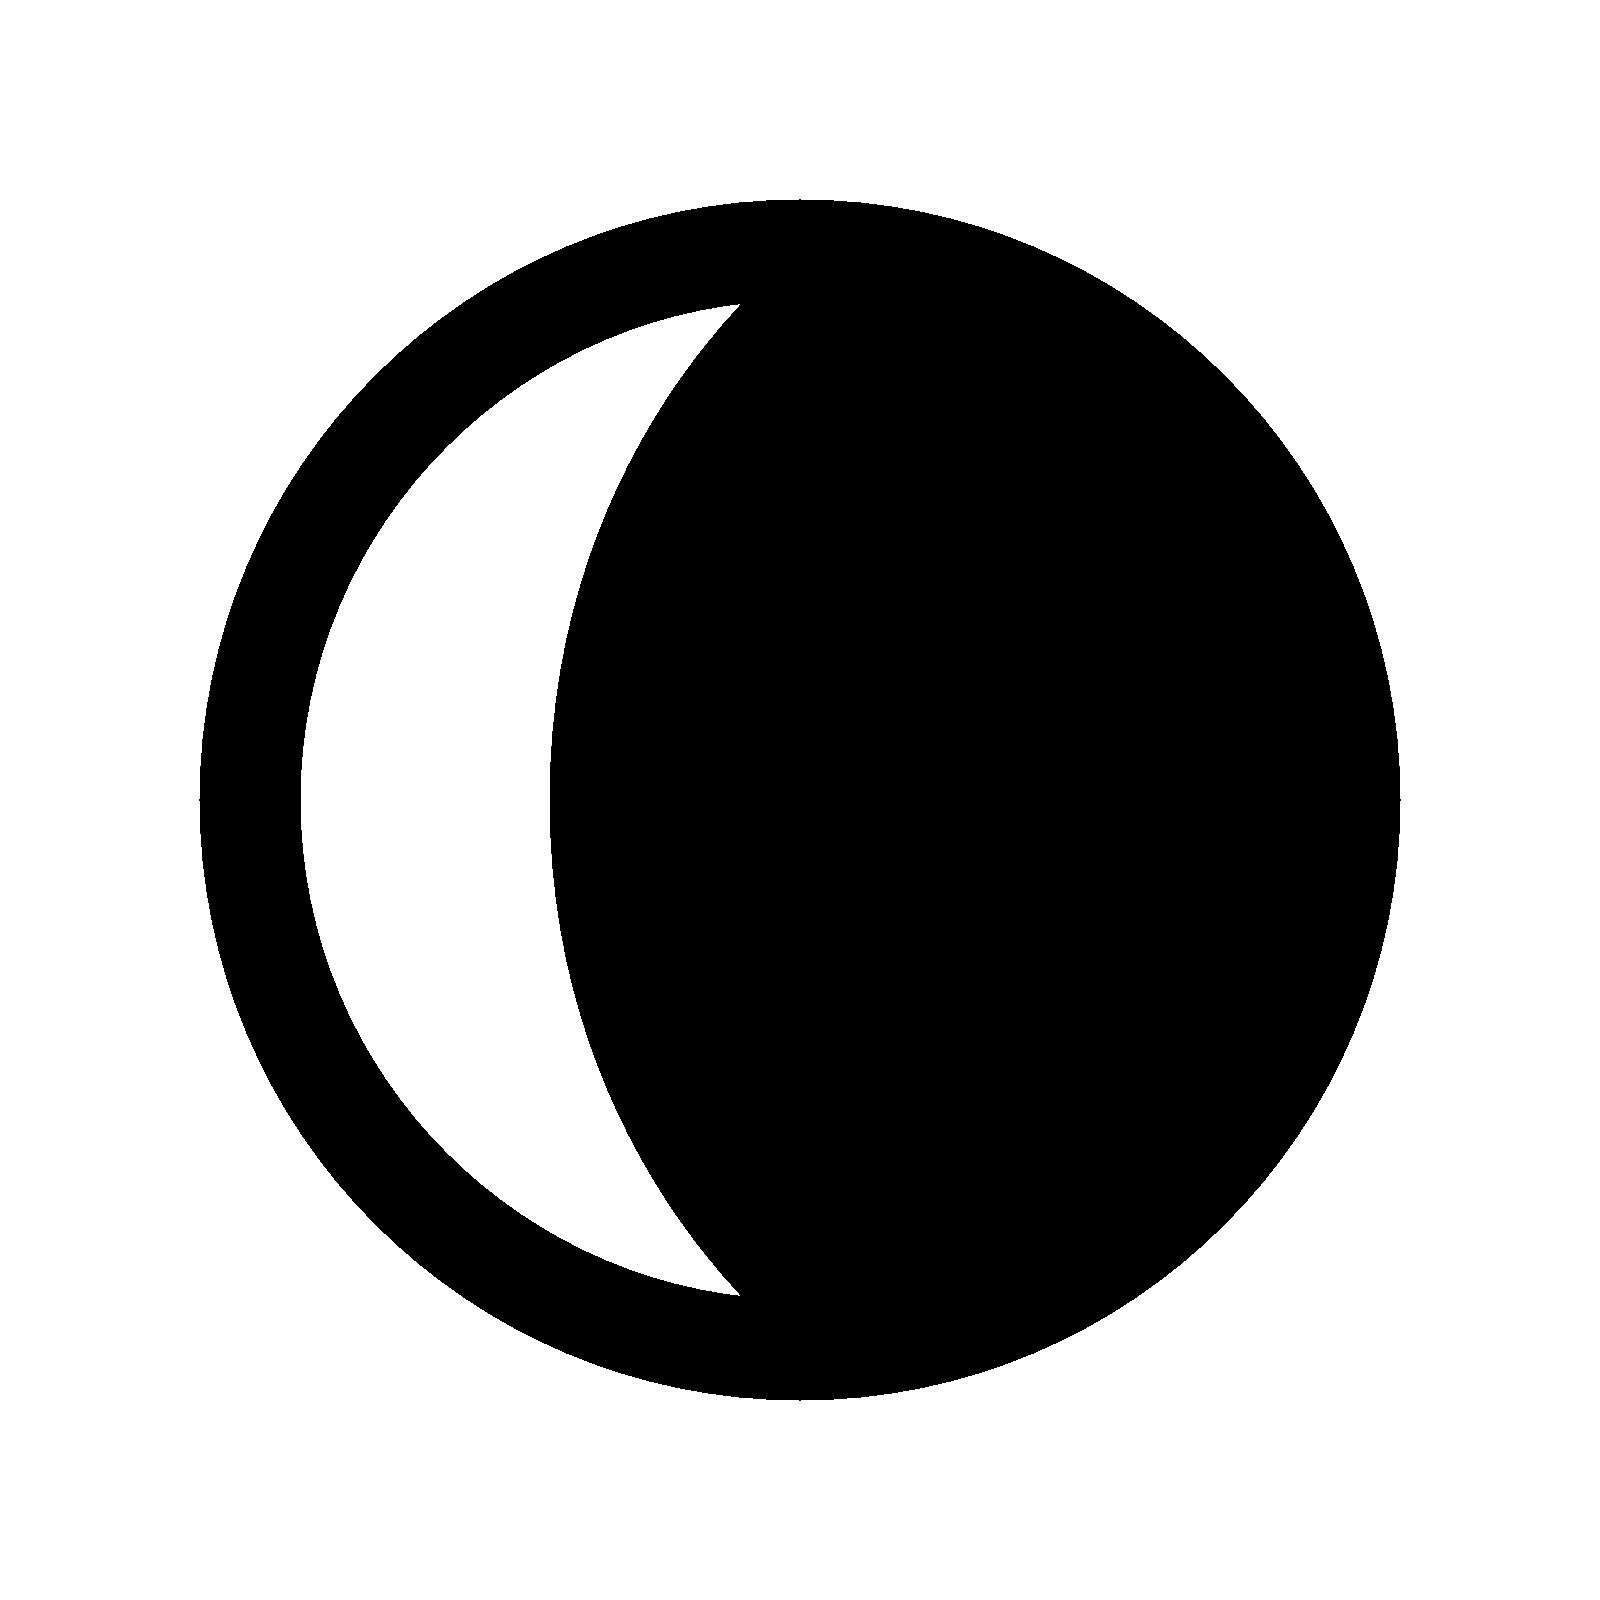 Clipart sun quarter. Images of moon spacehero